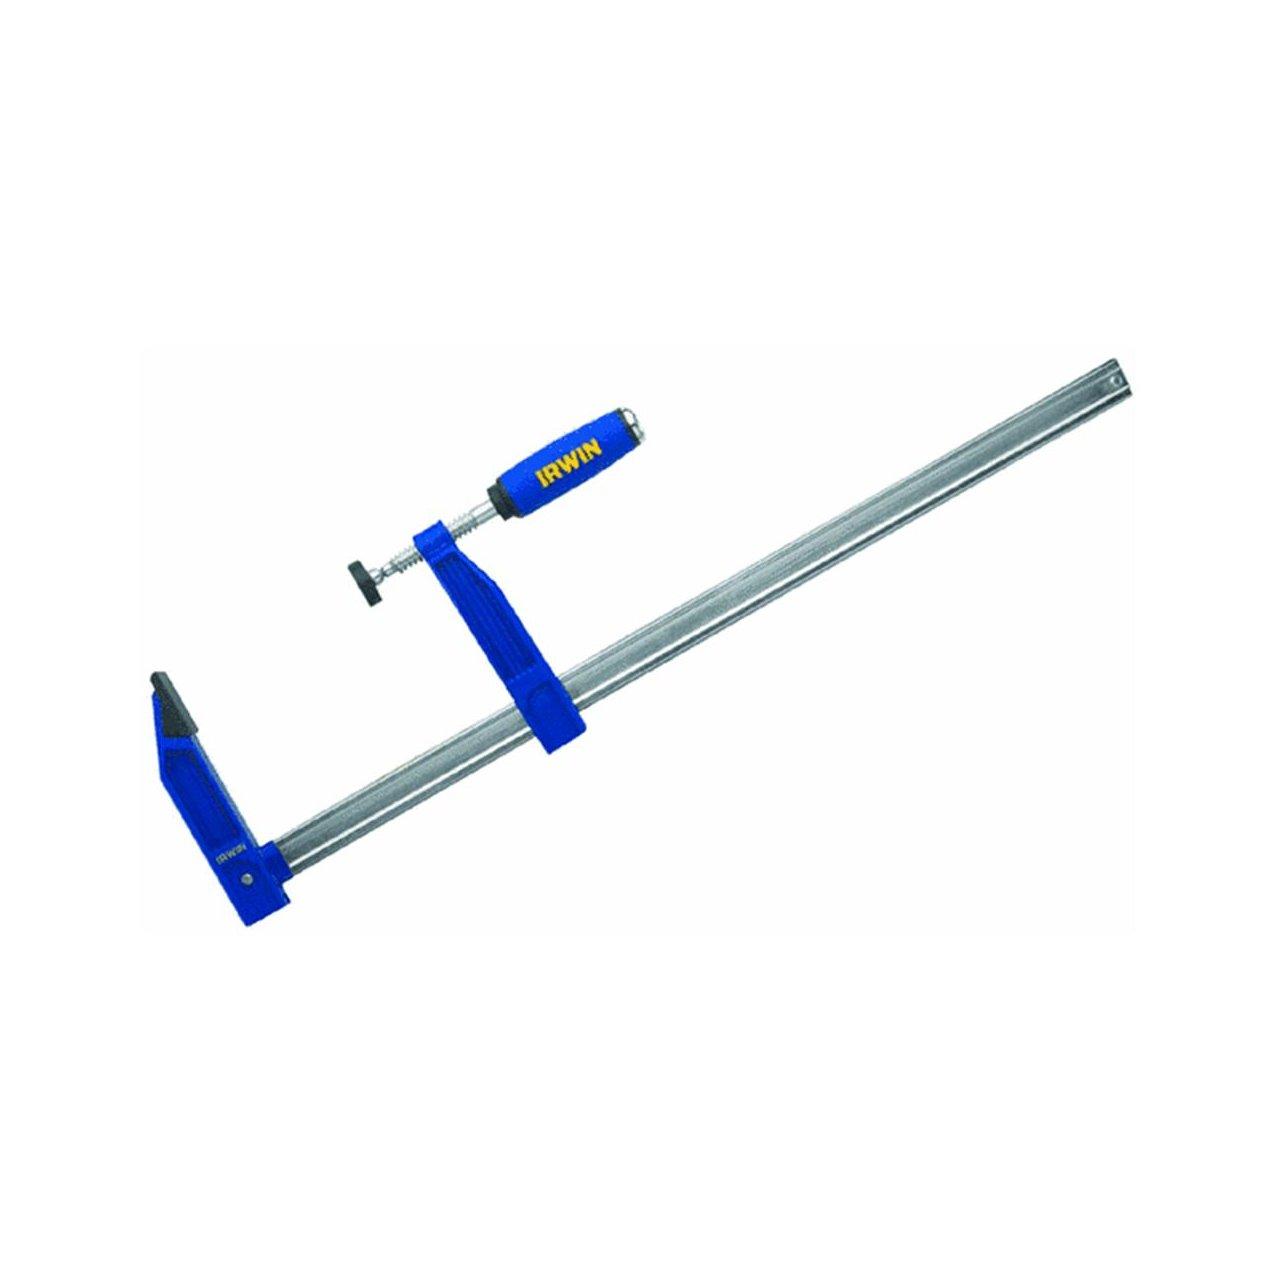 IRWIN Tools Record Clutch Lock Bar Clamp, 30-inch (223130)